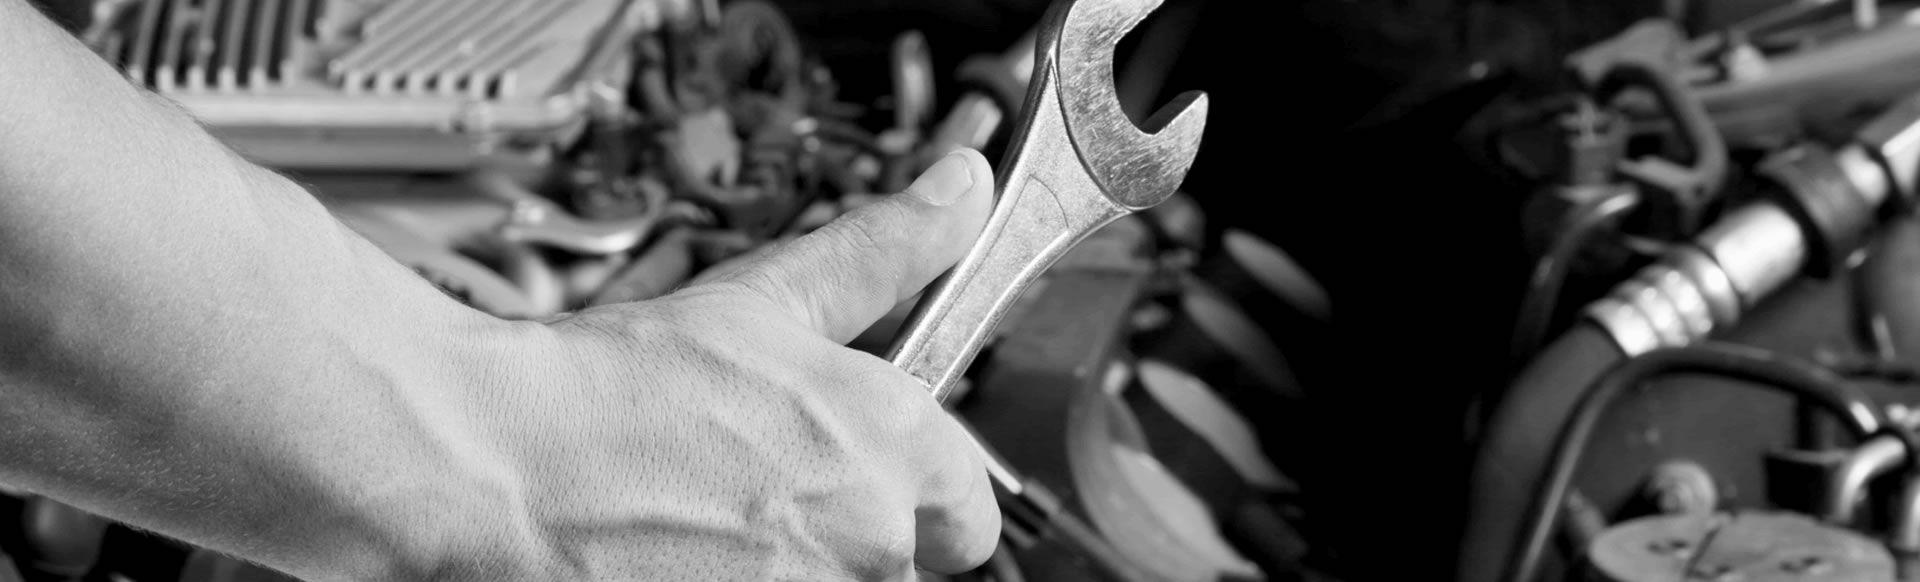 auto repair in las vegas nv Las vegas, Las vega nv